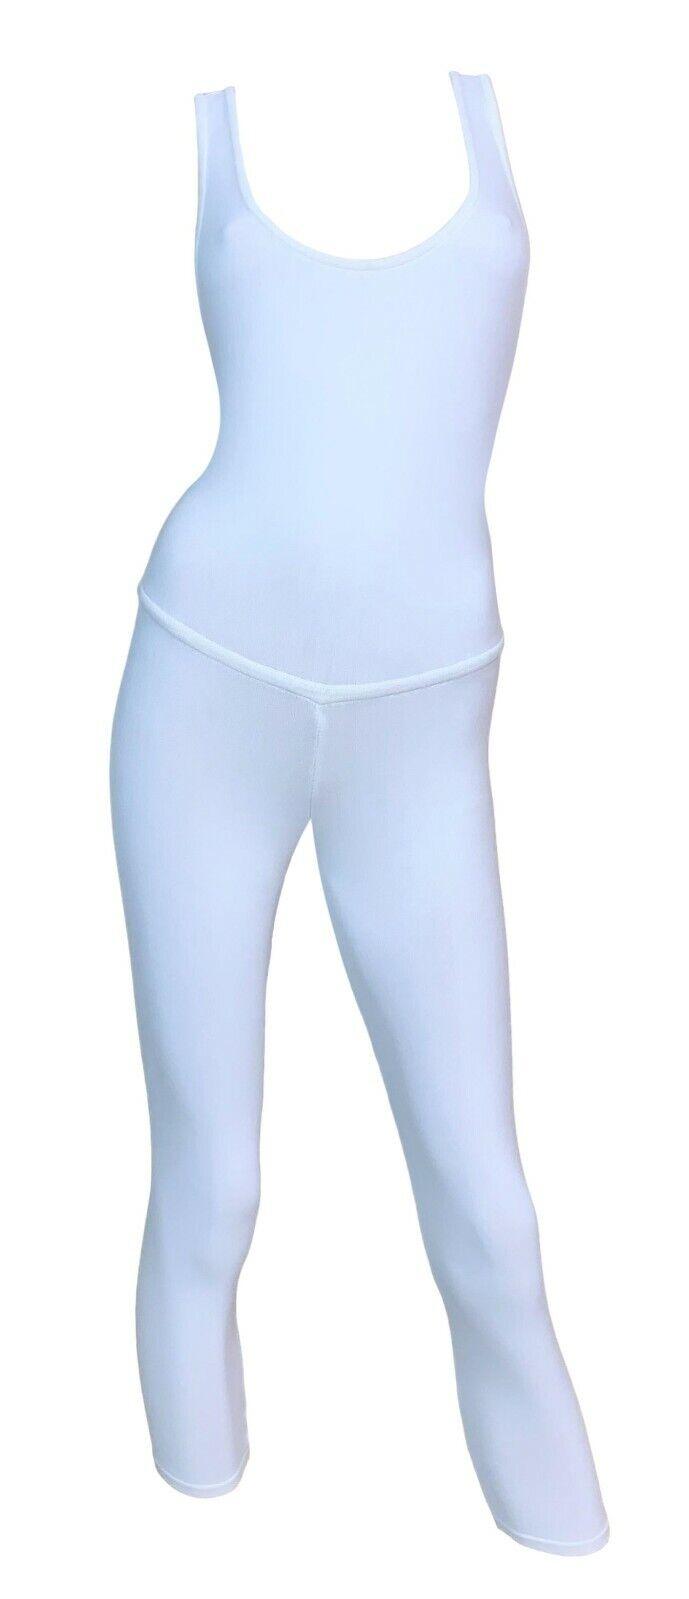 Vintage 1990's Dolce & Gabbana White Knit Bodycon… - image 1